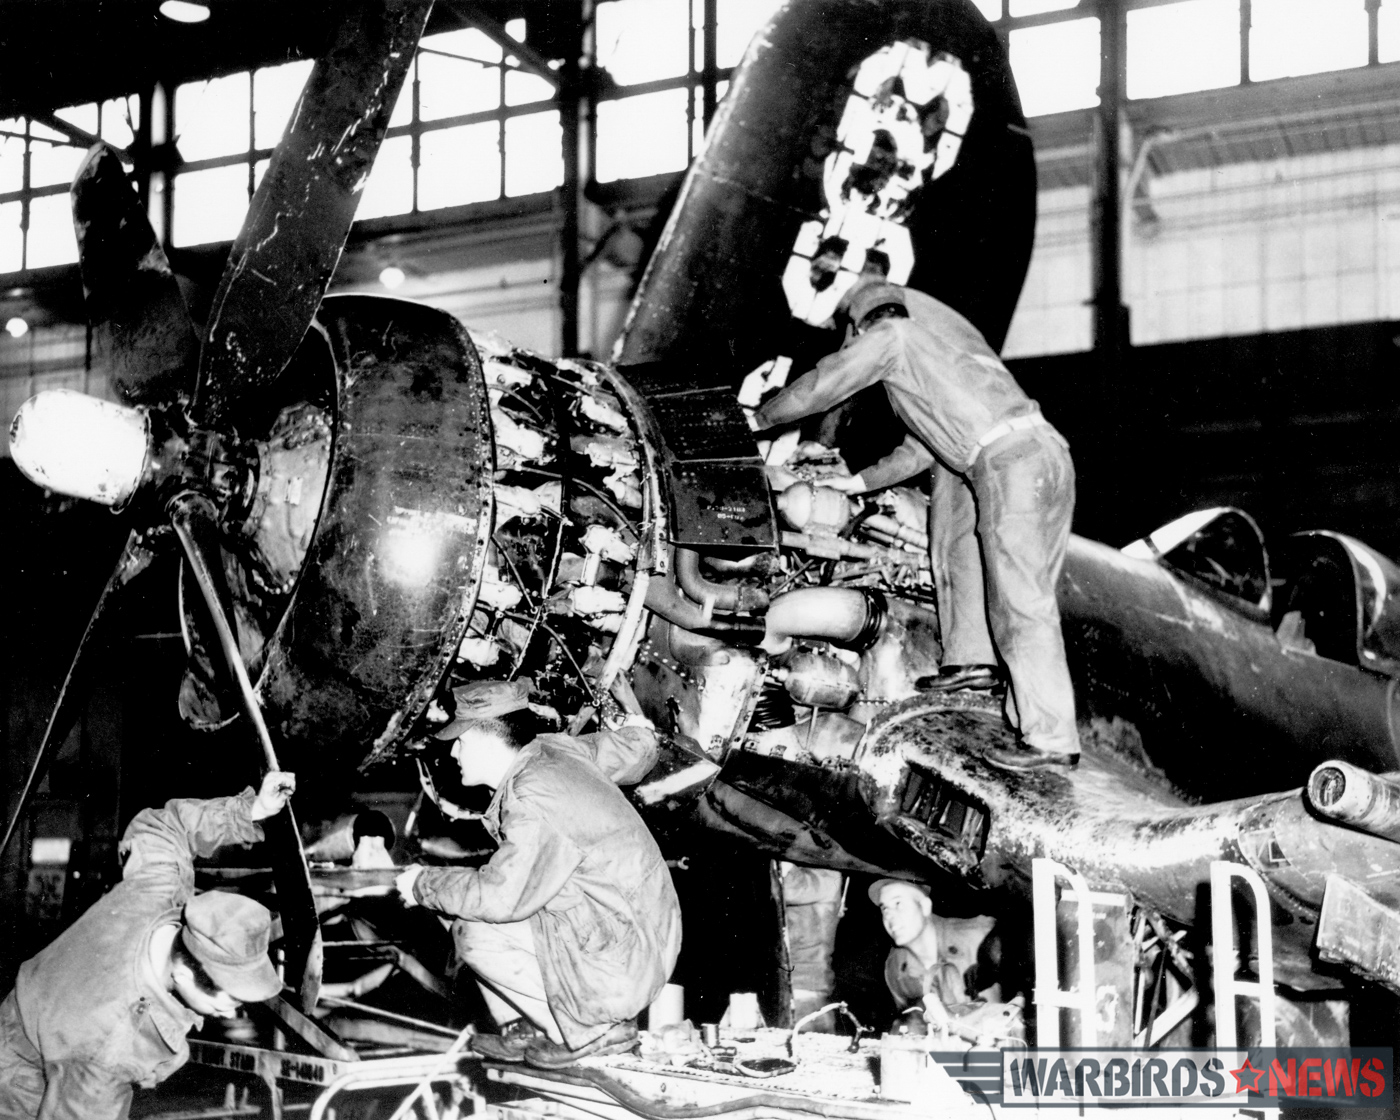 Bu.133693 undergoing maintenance at NAS Norfolk on April 13th, 1967. (photo via Stephen Chapis)